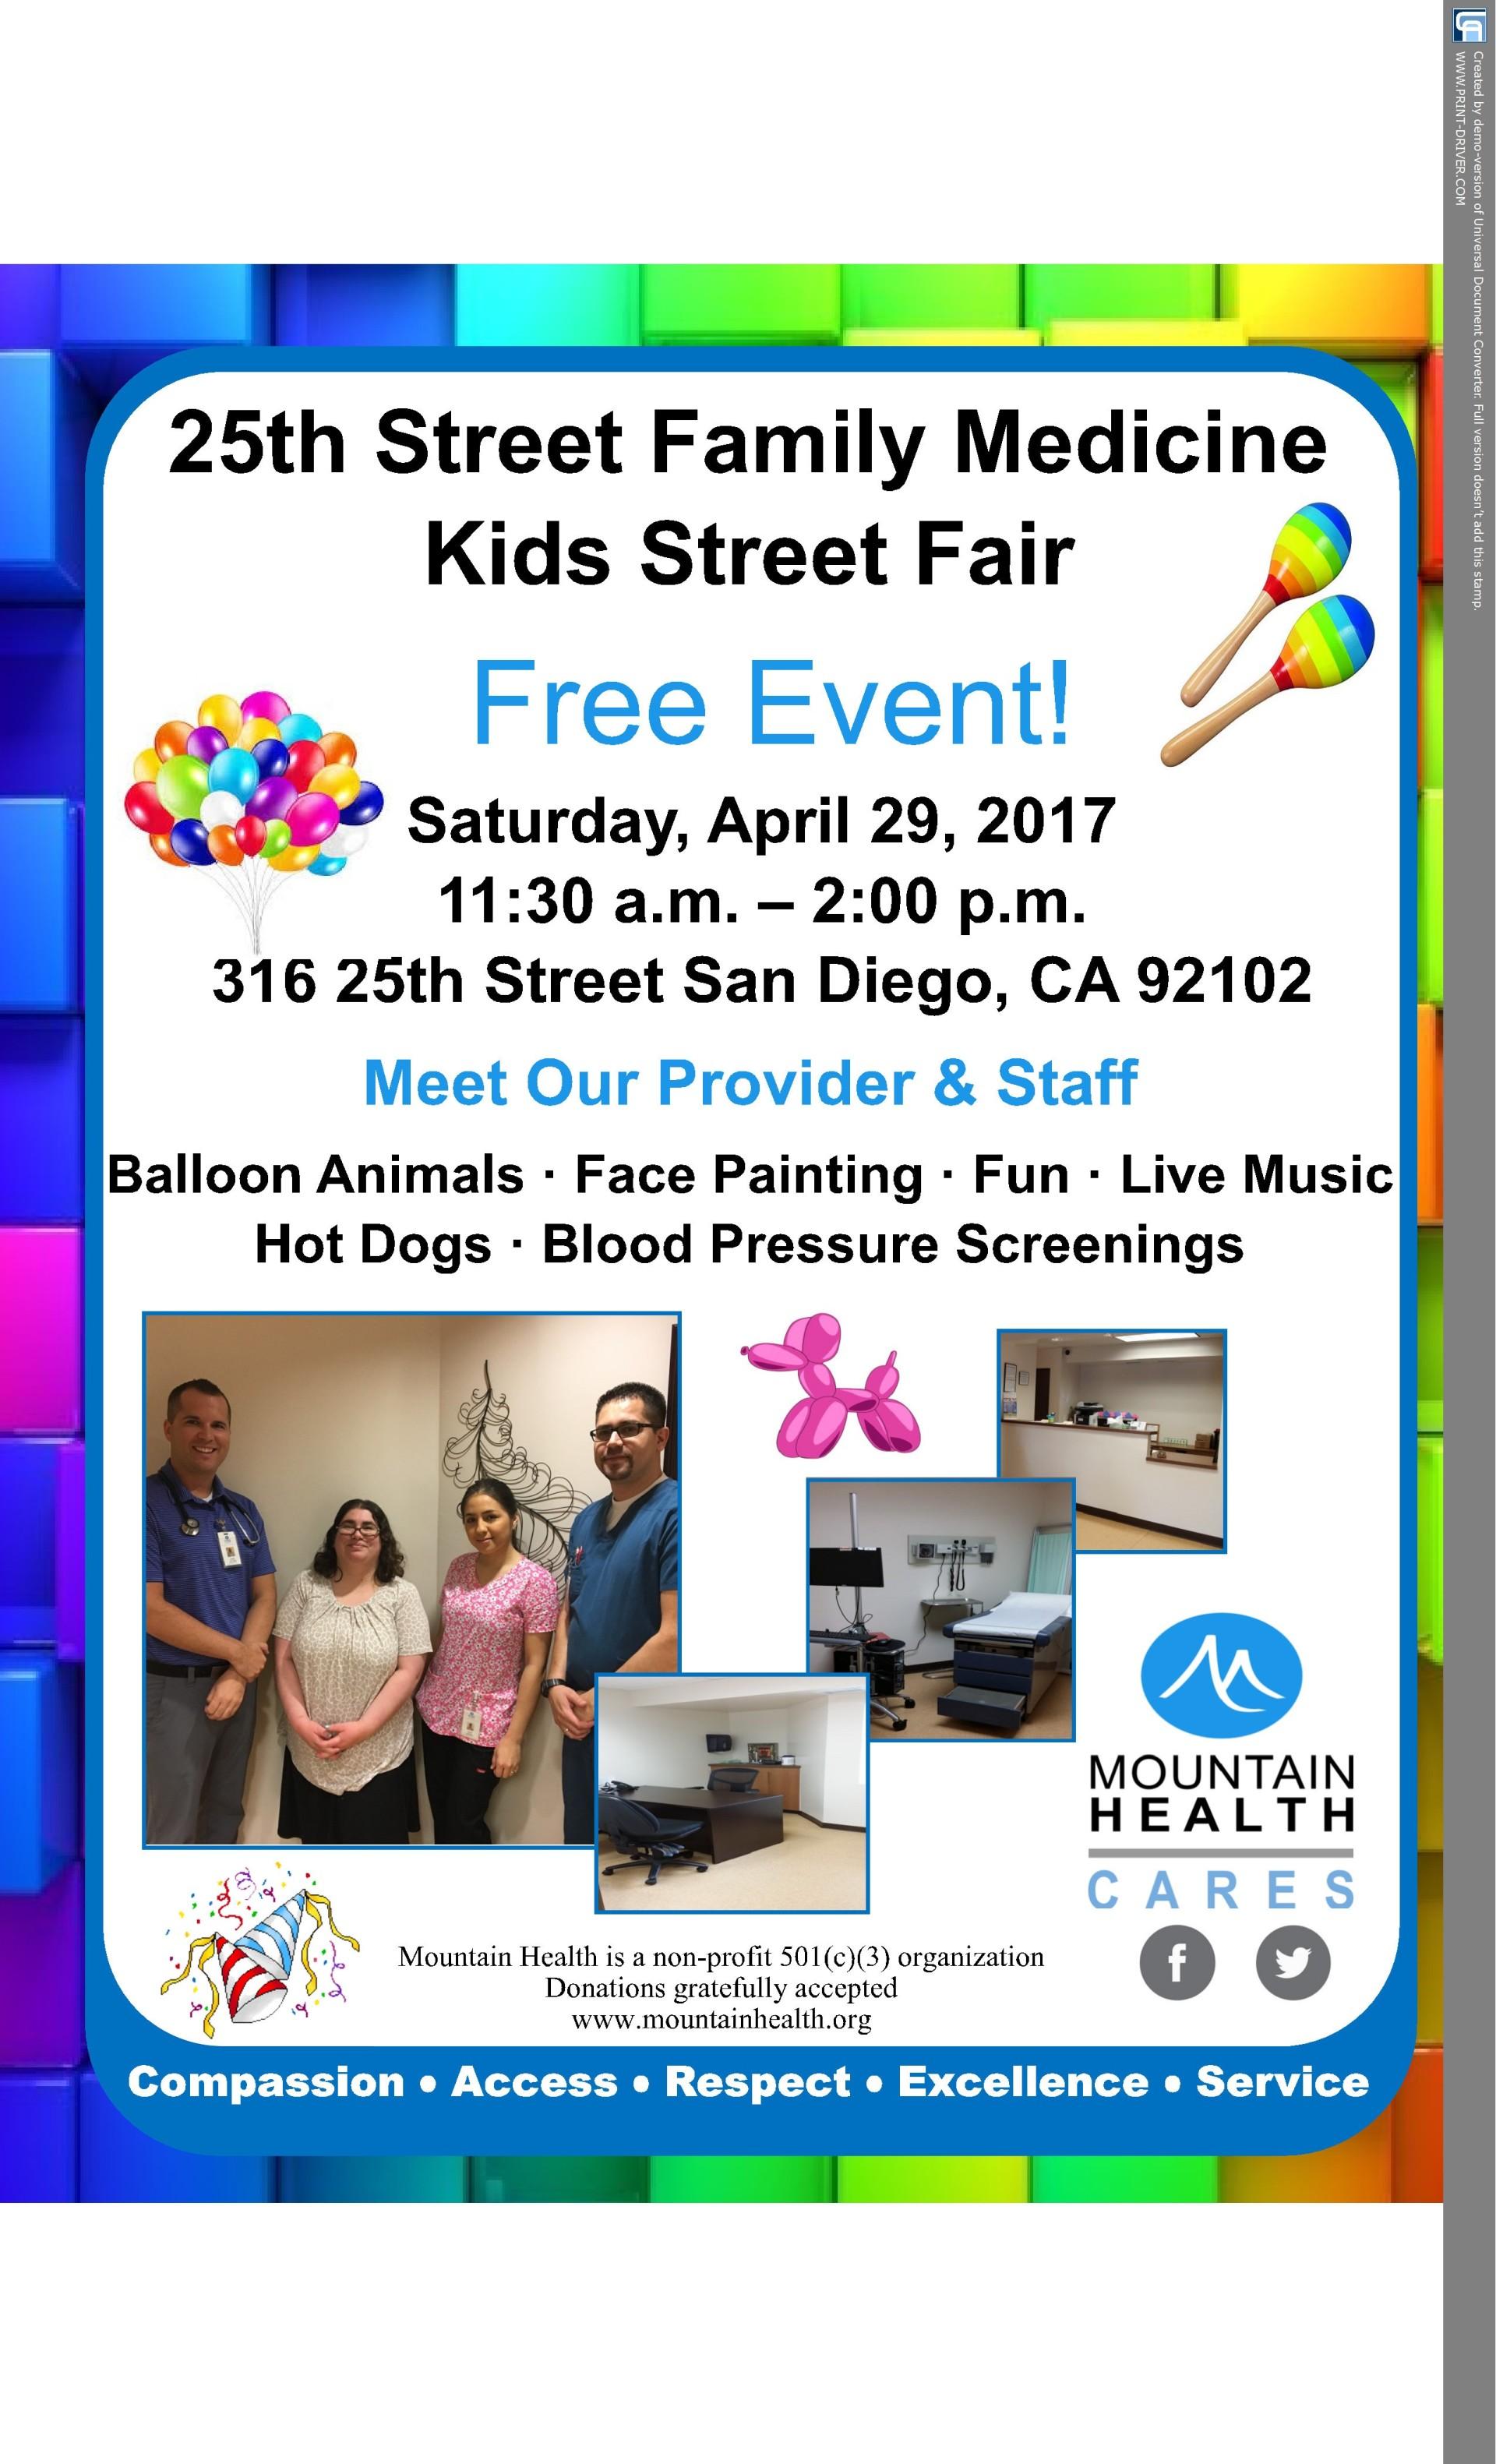 Mtn-Health-Flyer-for-Event-on-April-29-w1920.jpg